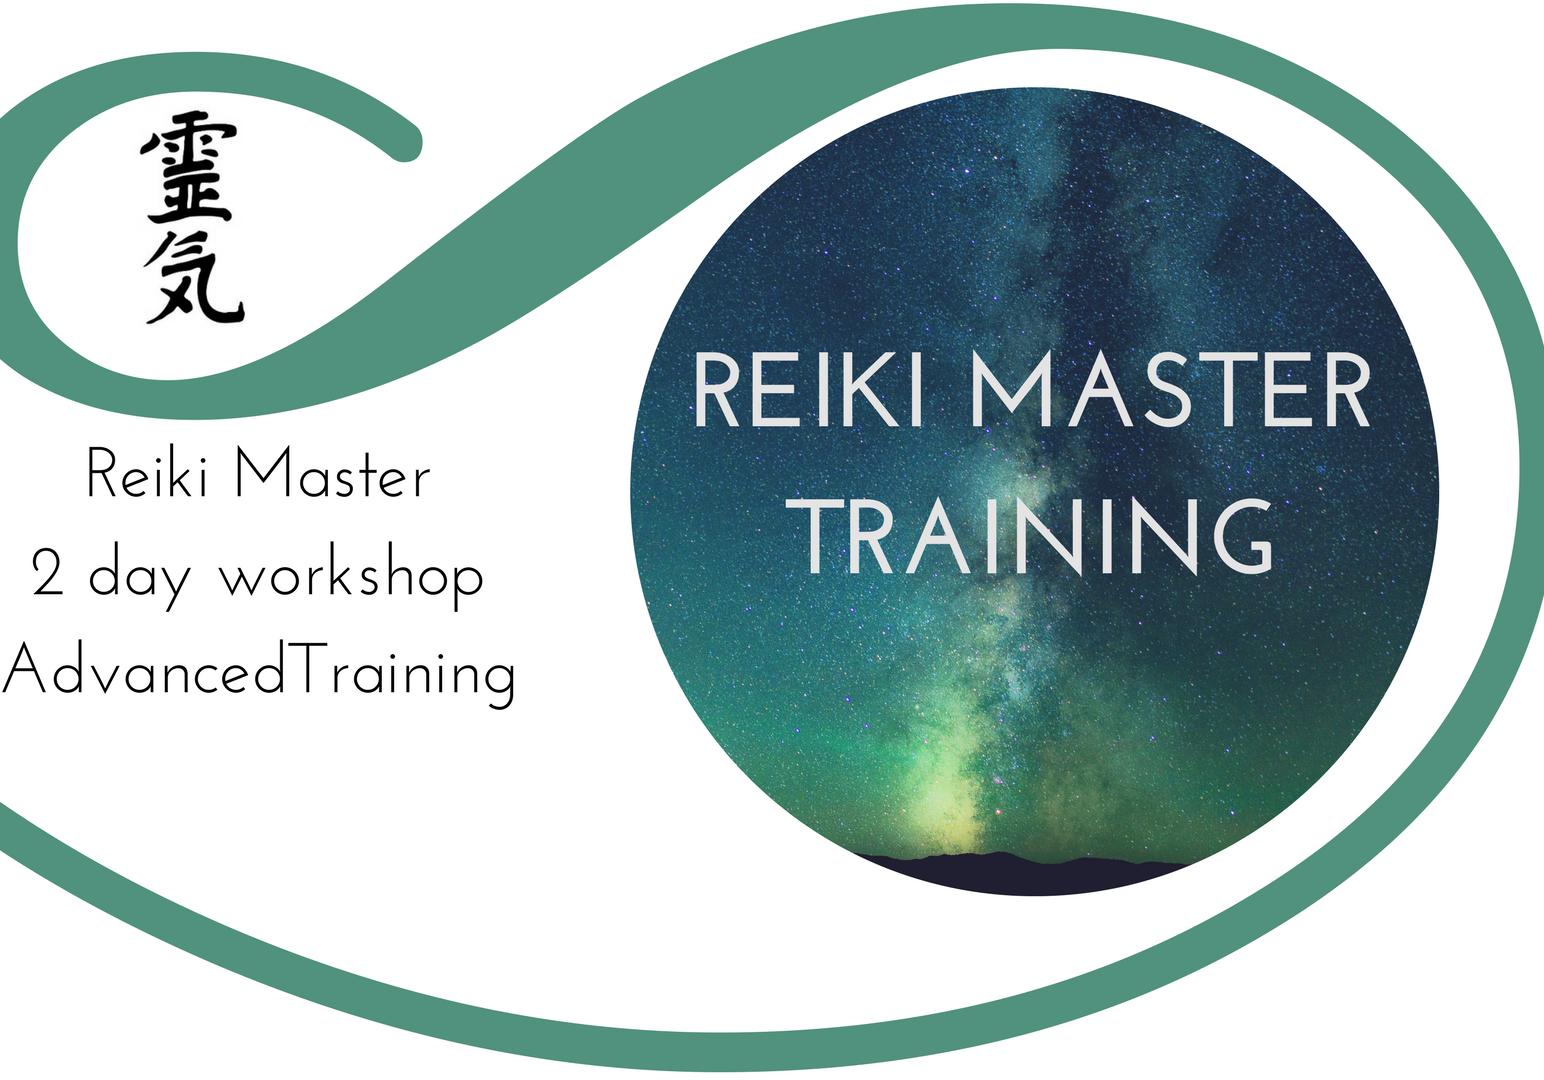 Reiki-Master.png